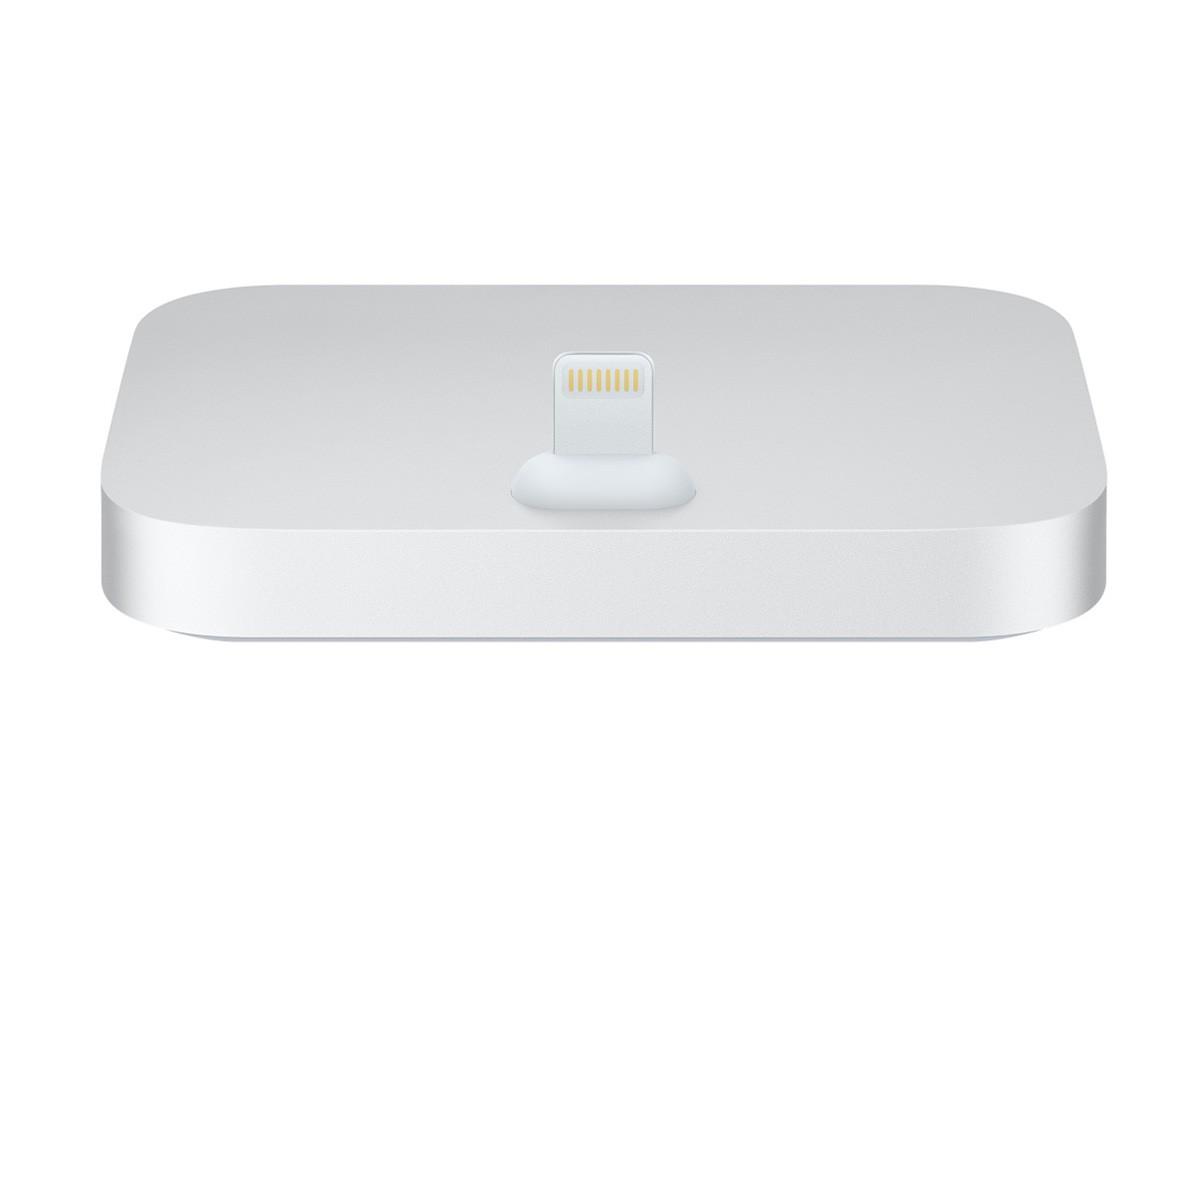 Apple iPhone Lightning Dock - stříbrný ml8j2zm/a